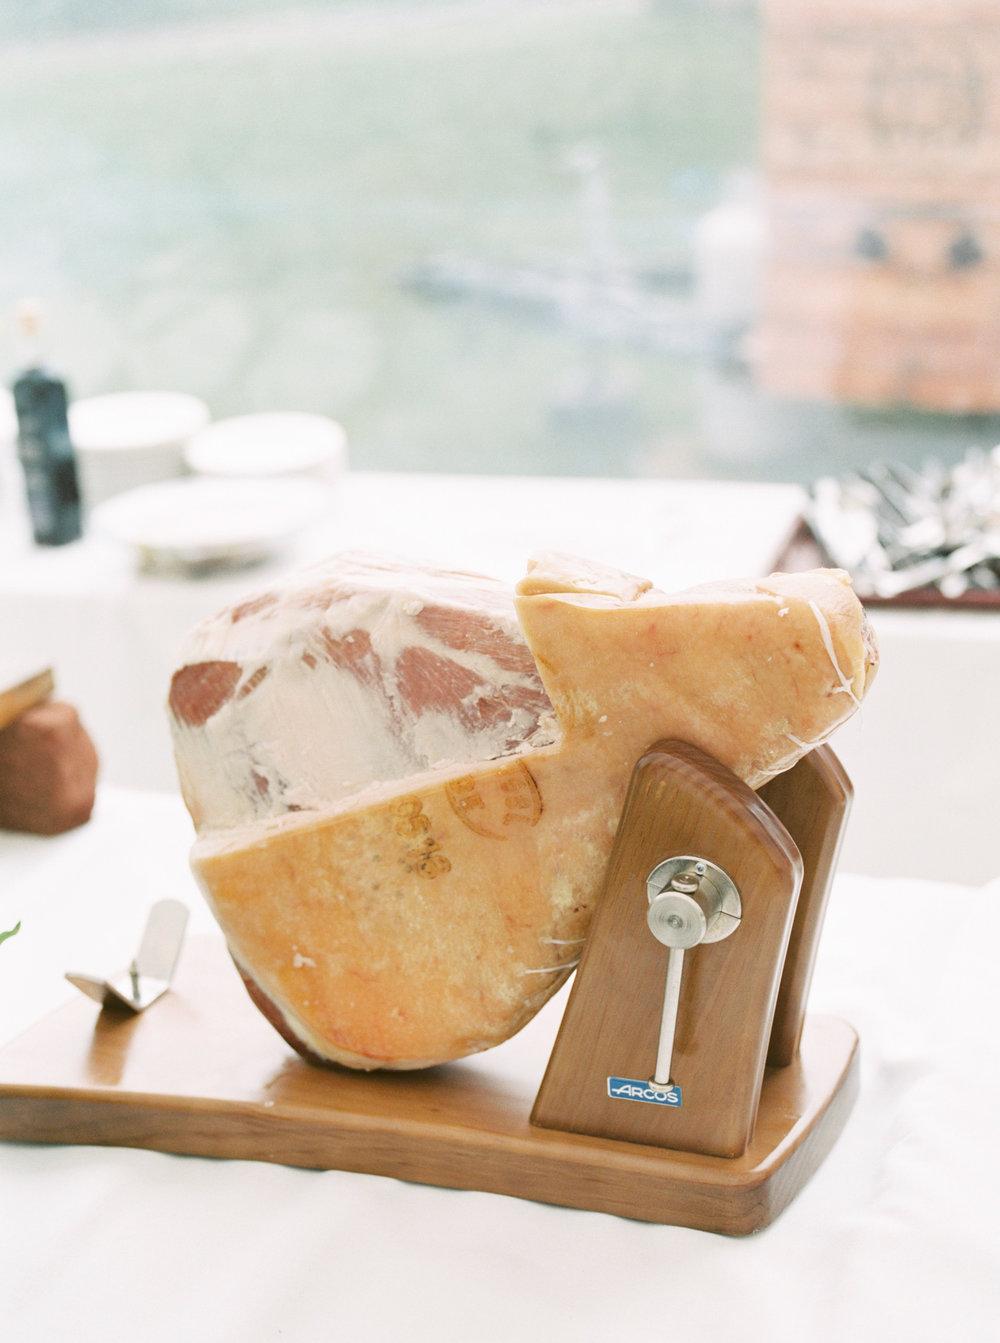 haley-richter-photography-keristin-gaber-associate-baltimore-country-club-spring-wedding-italian-lemon-inspired-168.jpg